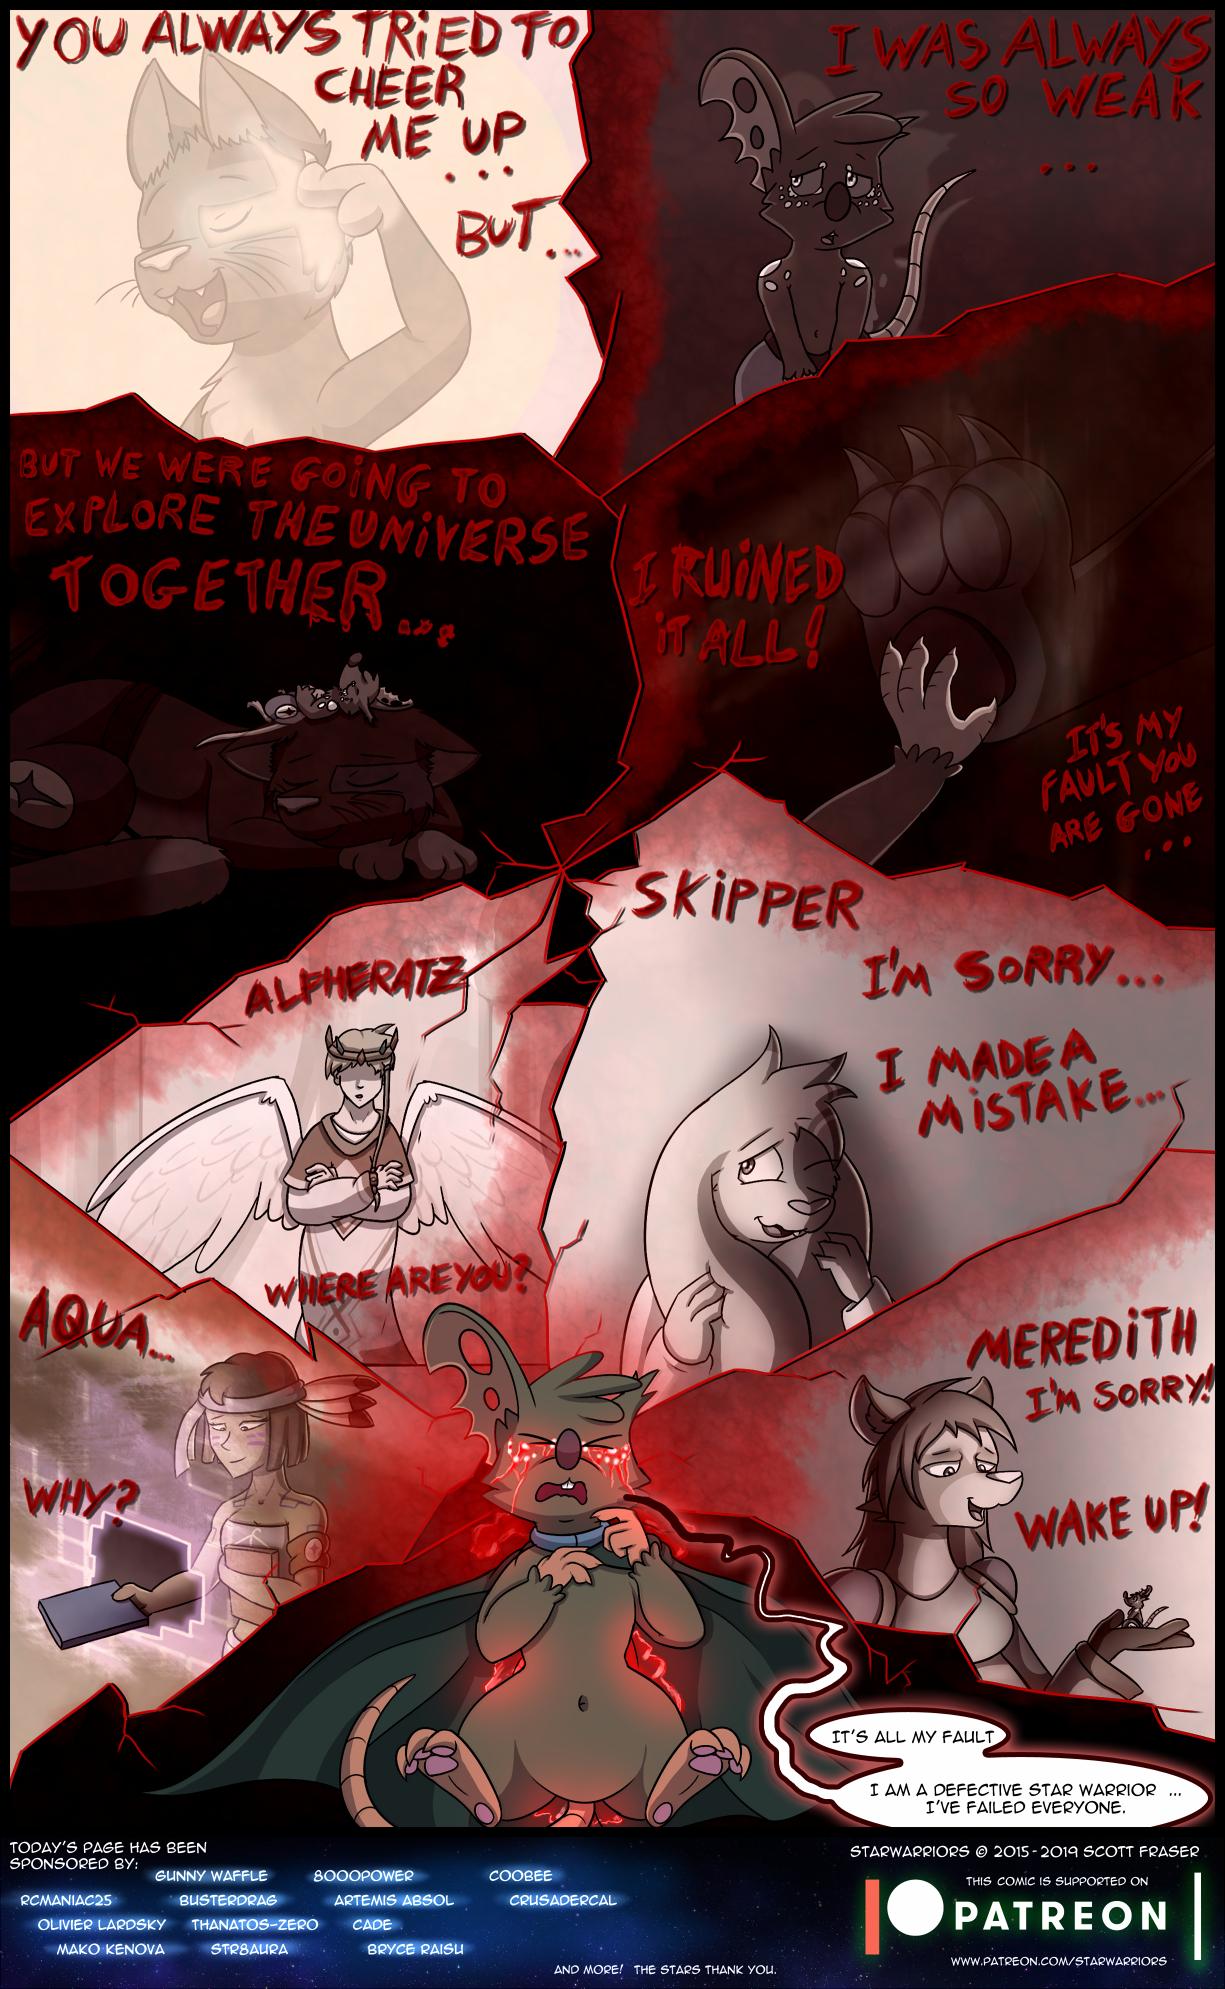 Ch4 Page 42 – I Failed Everyone